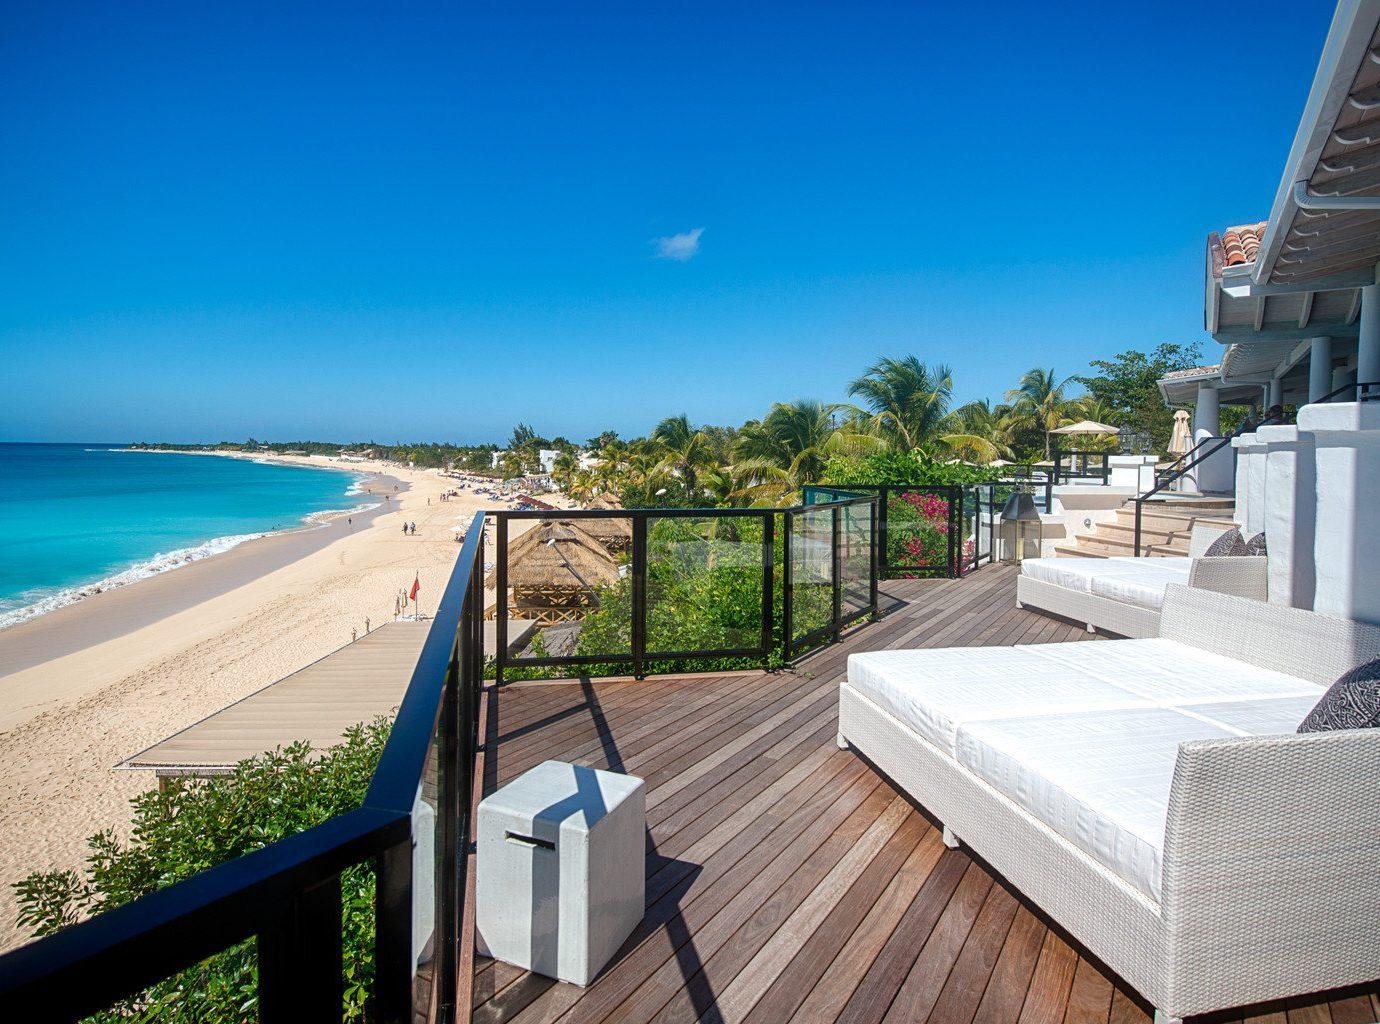 Beach Beachfront Family Hotels Luxury Play Resort Scenic Views Sky Outdoor Leisure Vacation Walkway Sea Swimming